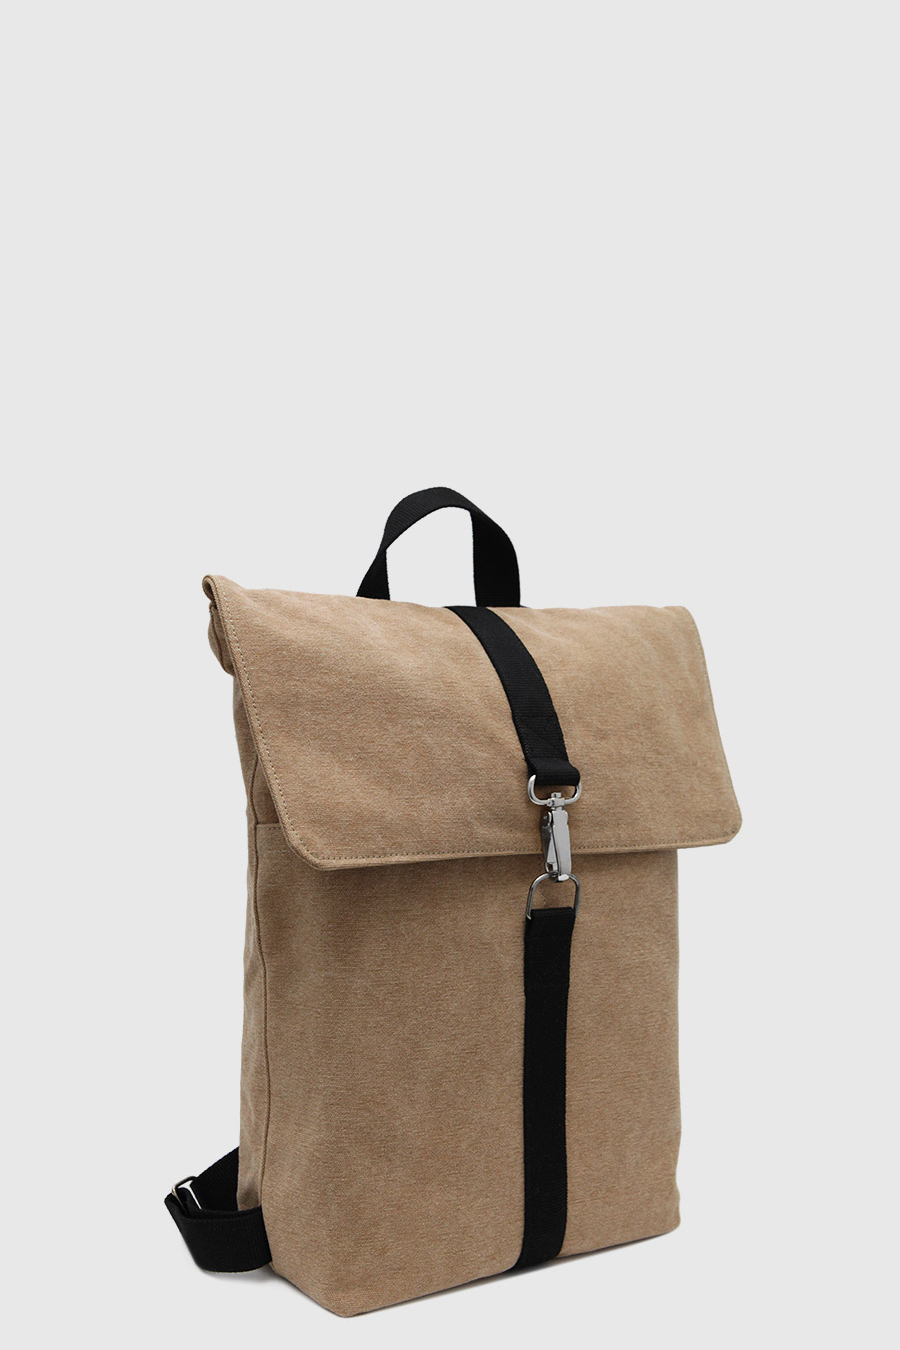 Mochila minimal impermeable urbana color marron claro made in Spain